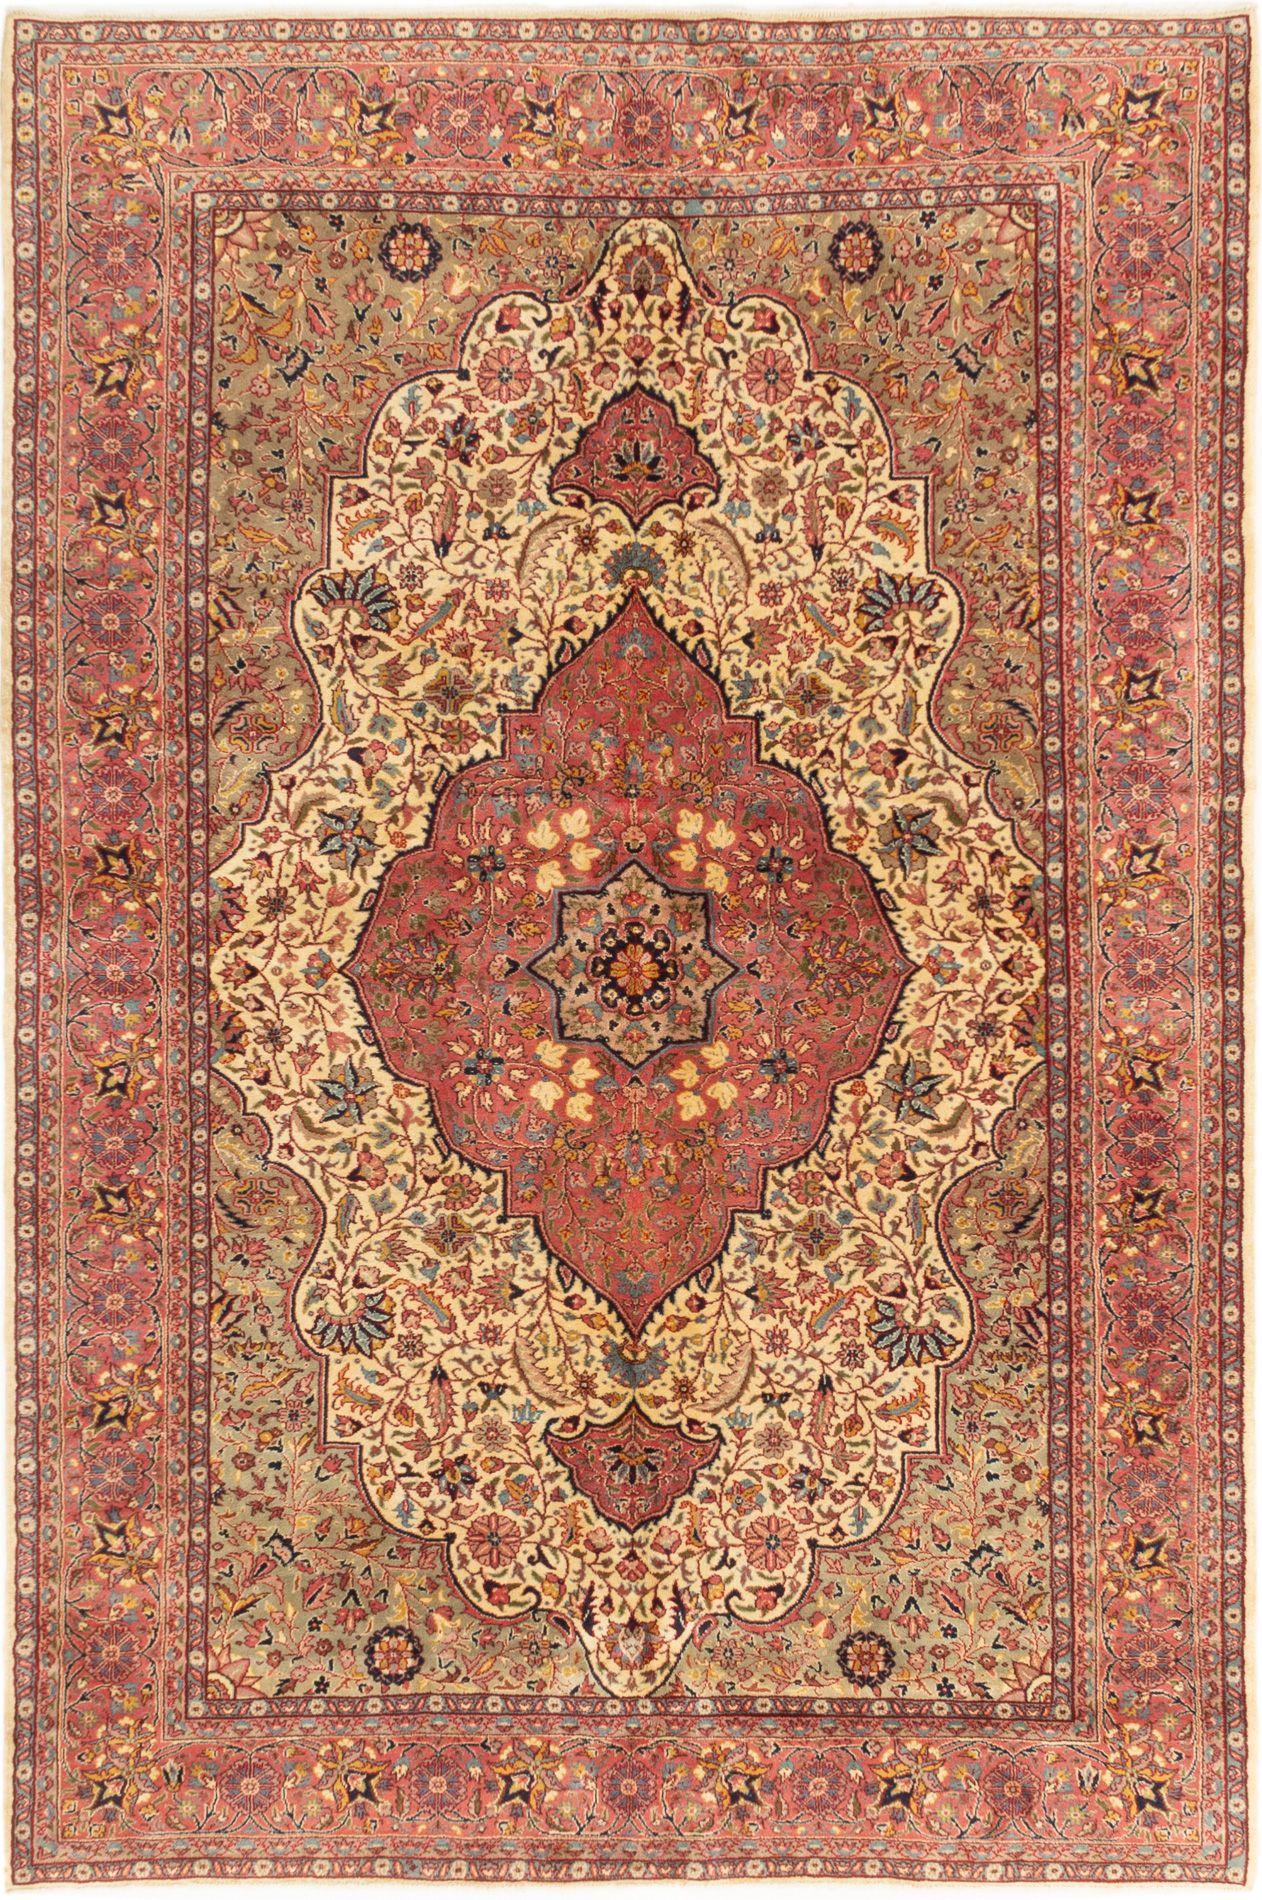 "Hand-knotted Anatolian Vintage Cream, Dark Pink Wool Rug 6'9"" x 10'2"" Size: 6'9"" x 10'2"""